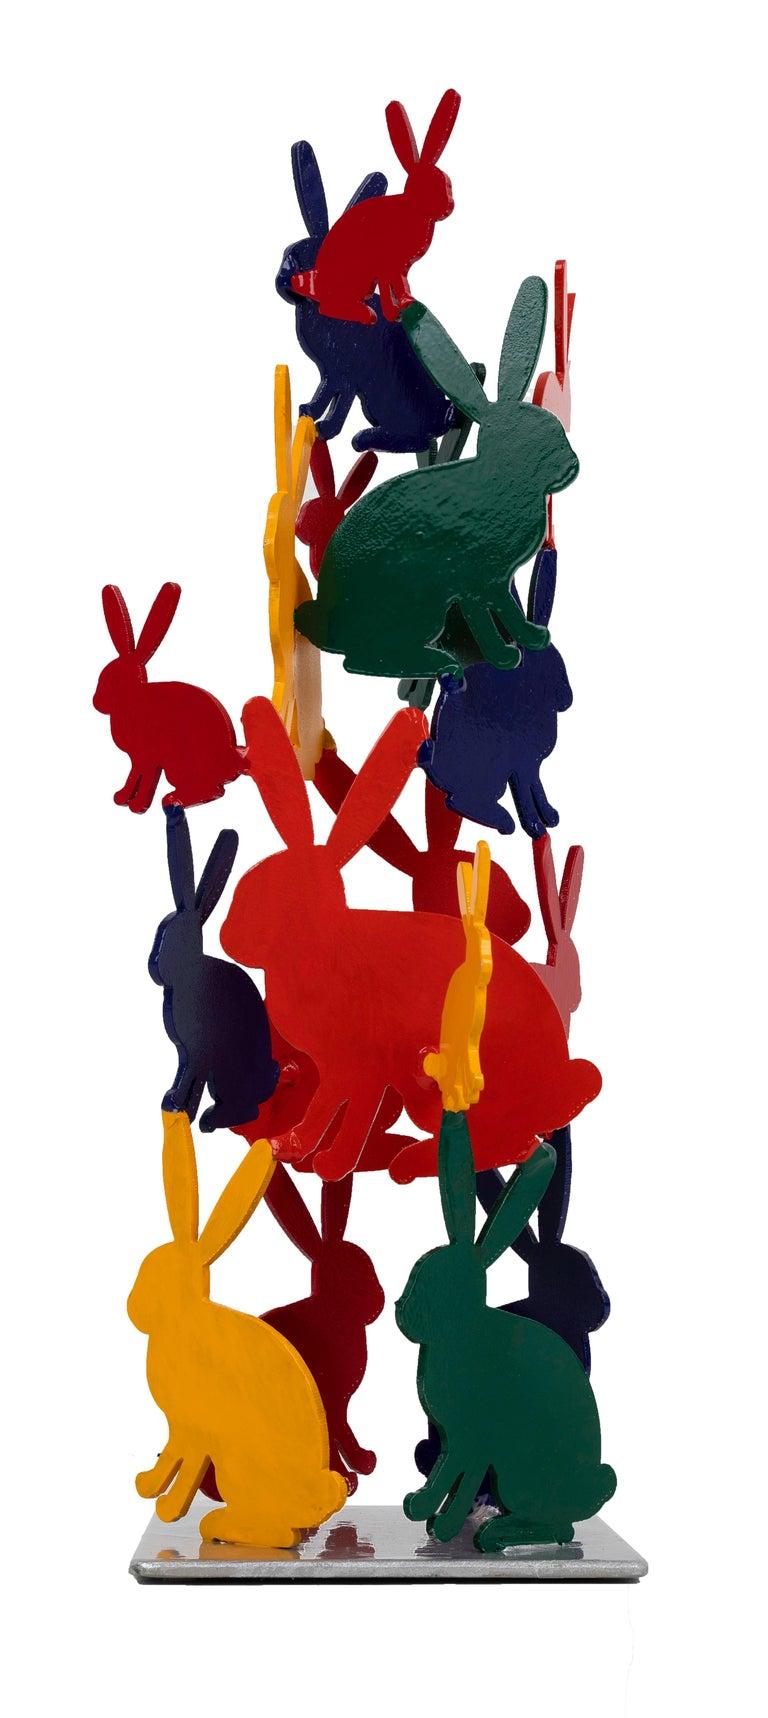 Hunt Slonem Bunnies aluminum sculpture 'Untitled' - Sculpture by Hunt Slonem